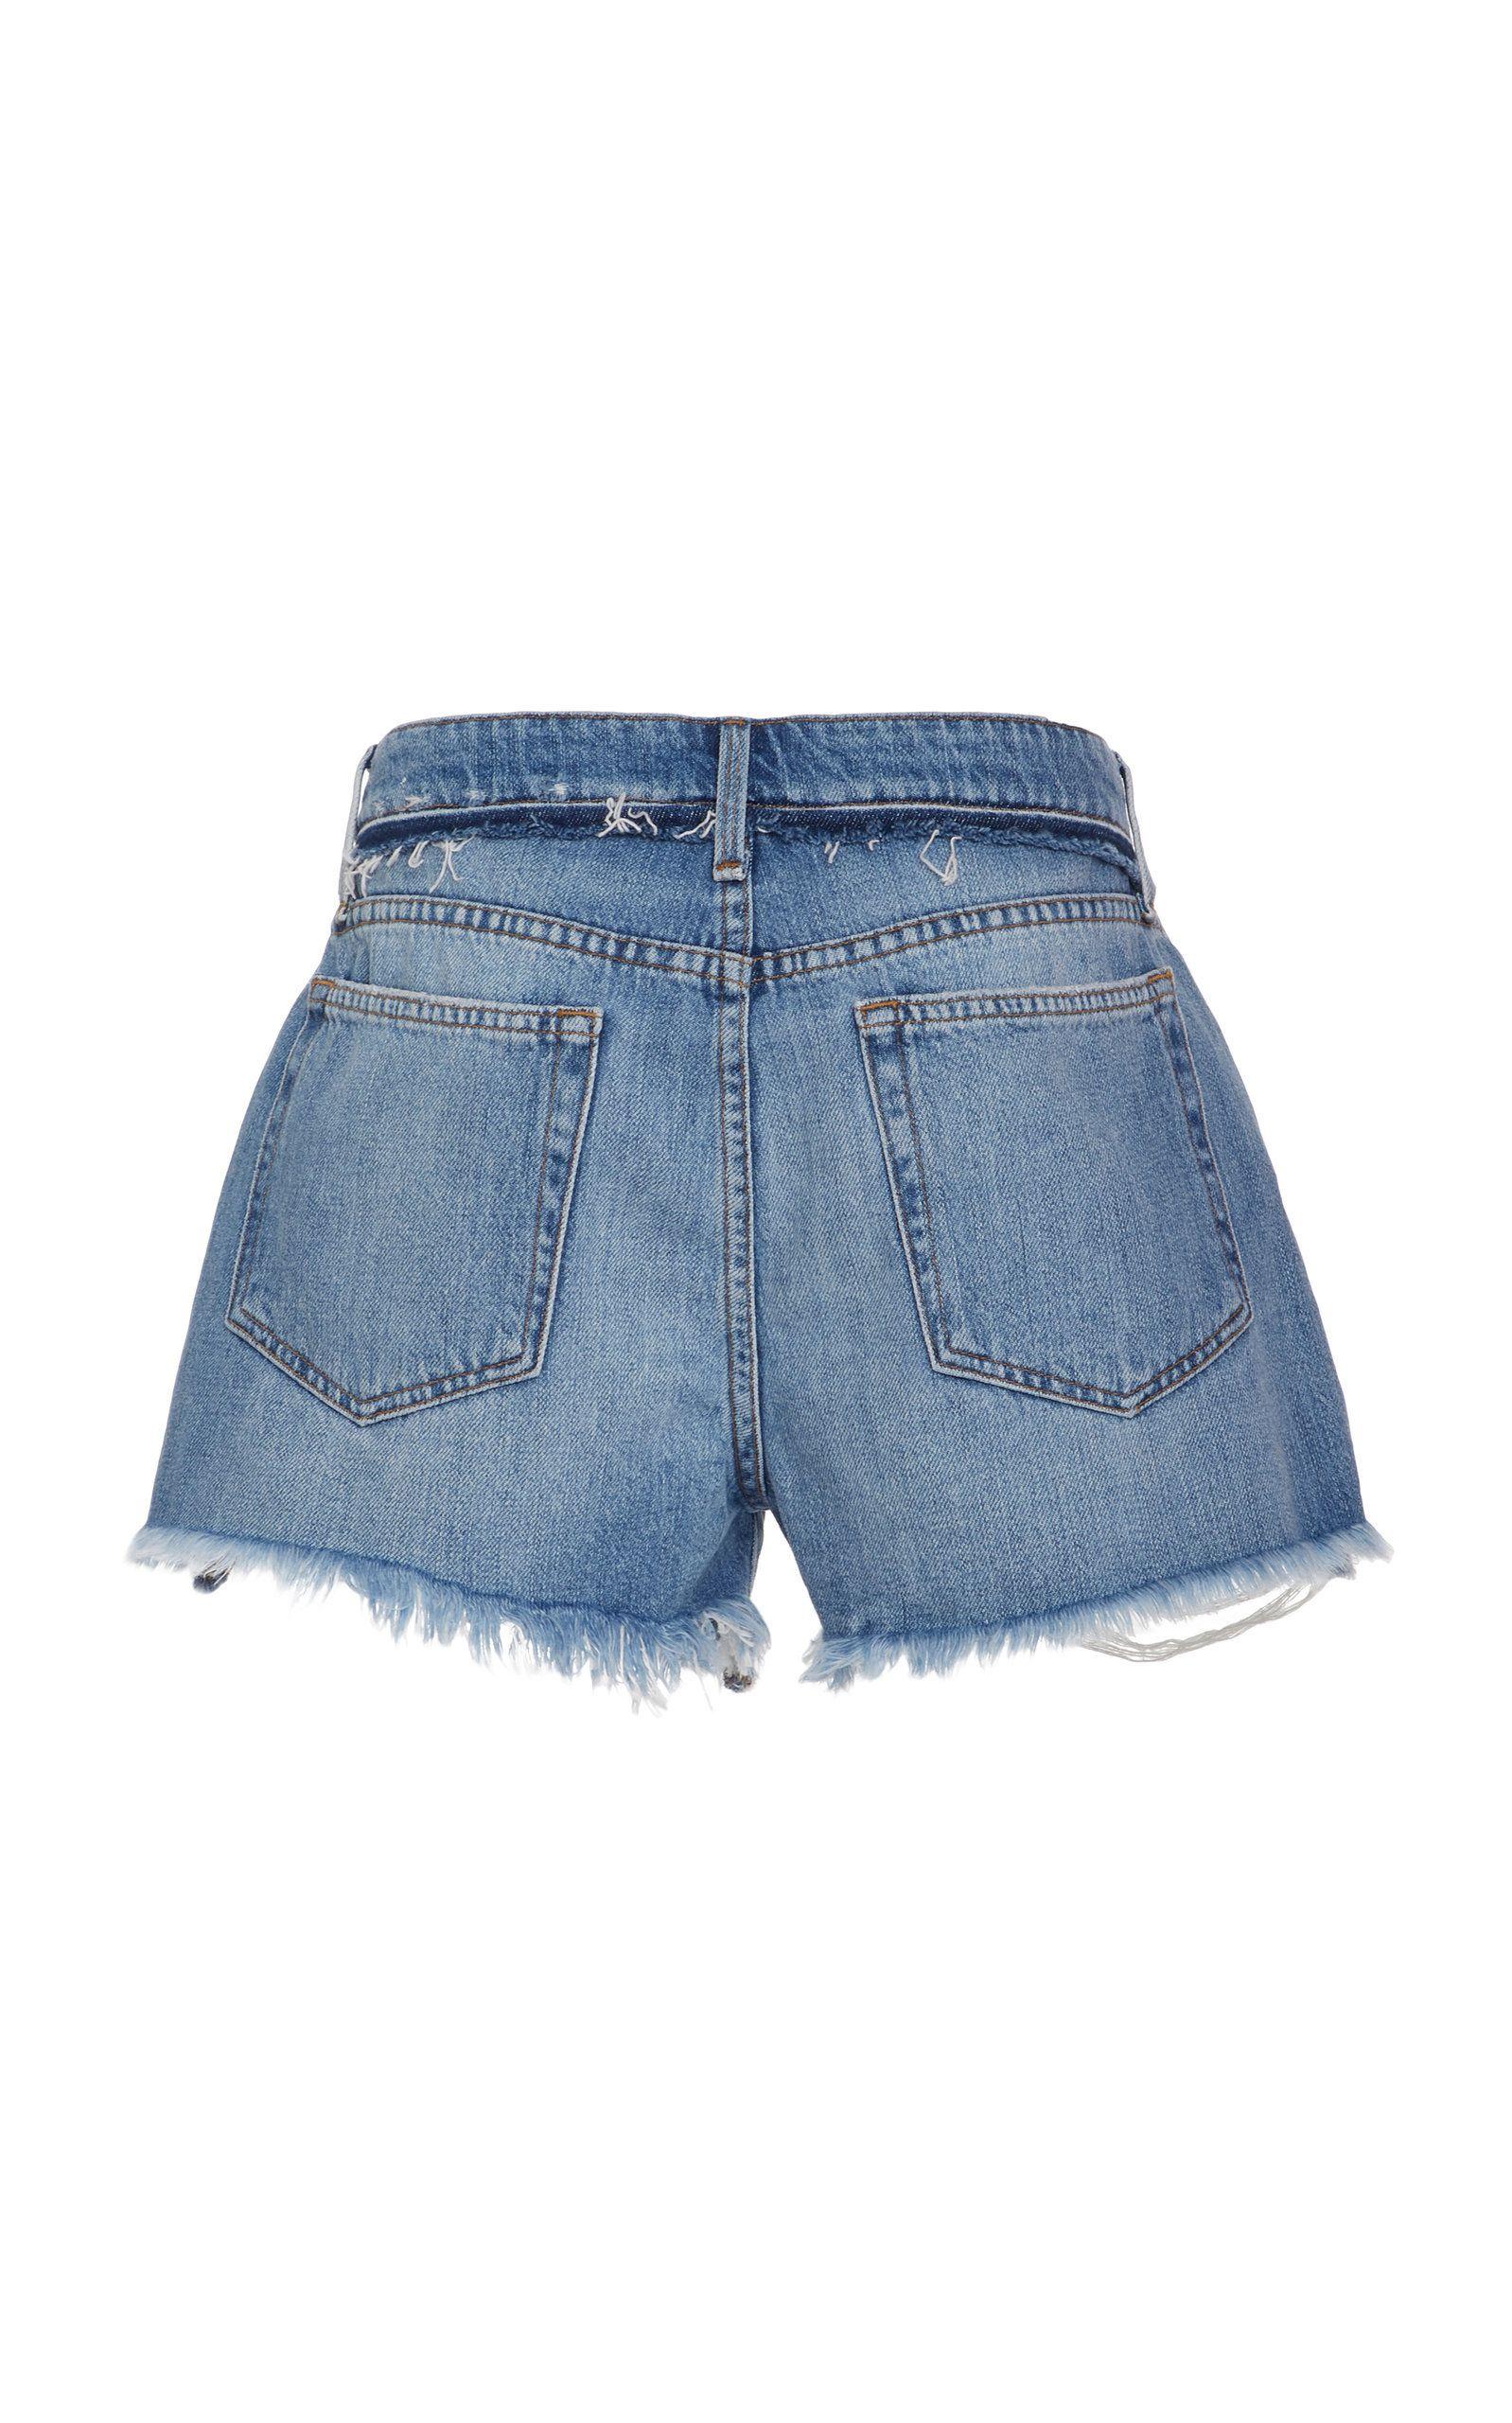 e7c09ce369 Le Grand Garcon Short   S.W. DENIM   Frame denim, Denim, Denim shorts